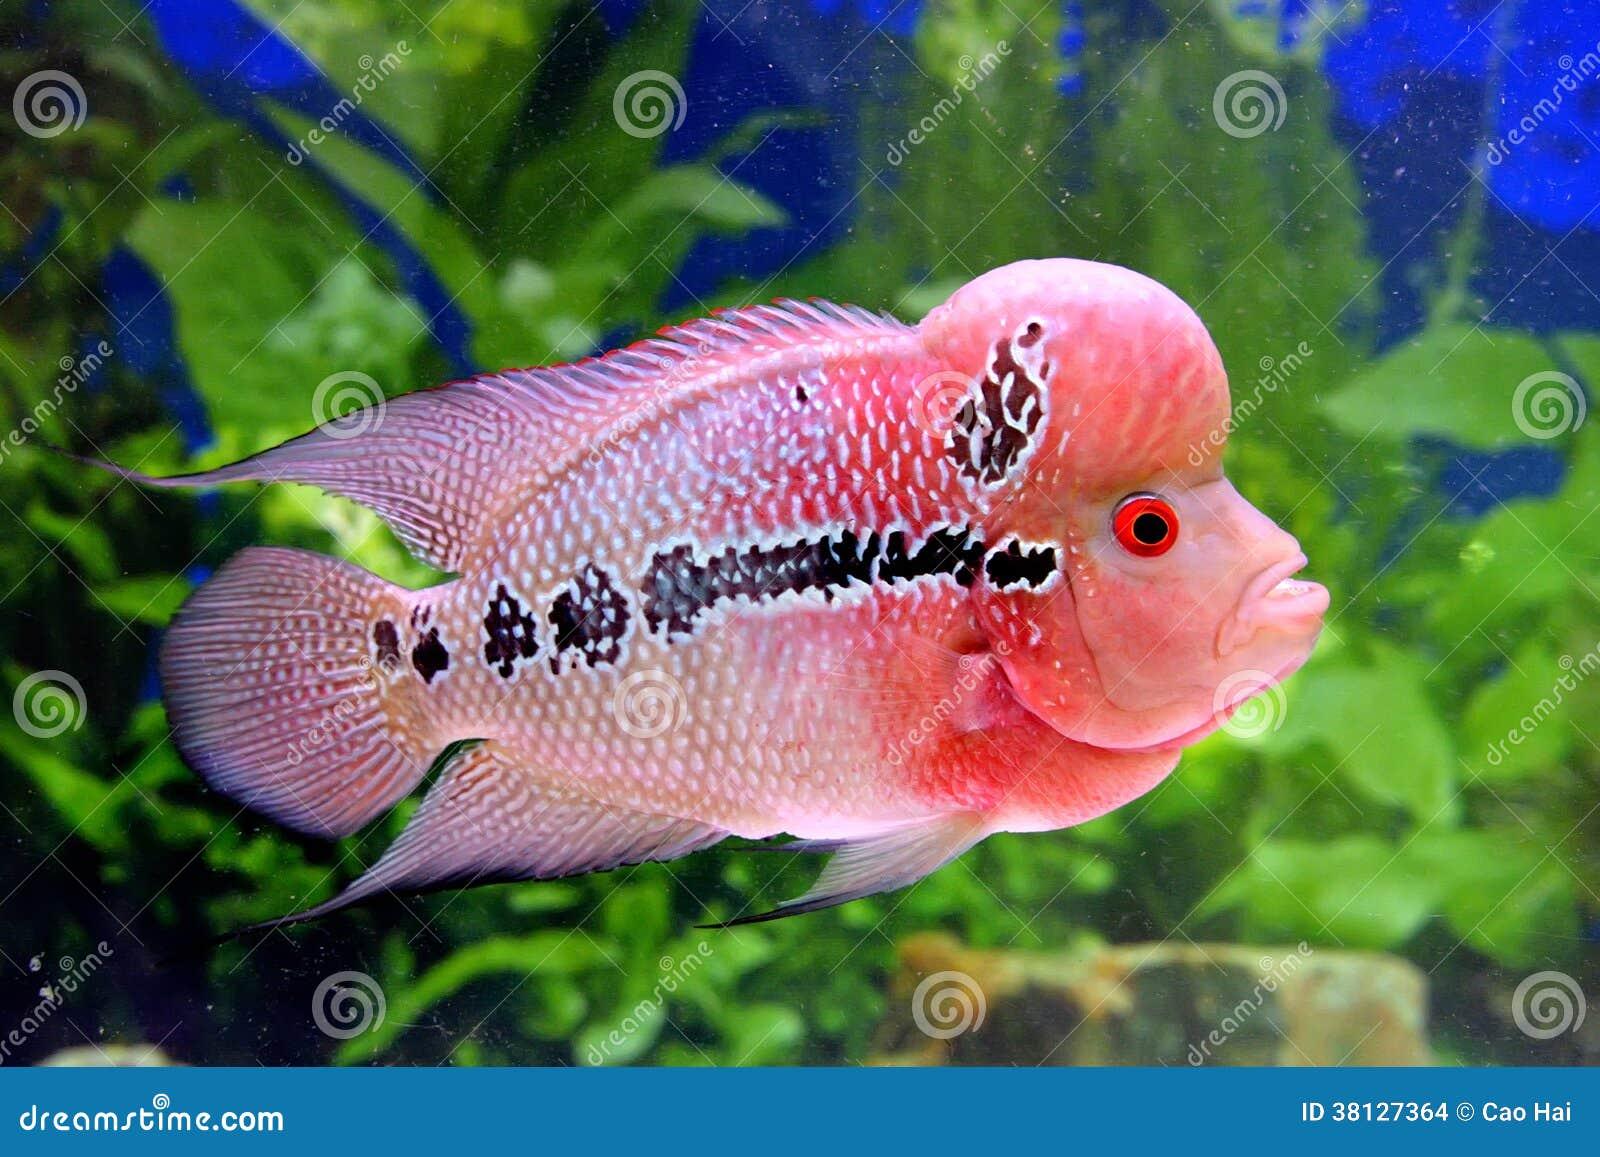 Beutiful aquarium fish in pink stock photo image 38127364 for Pink saltwater fish